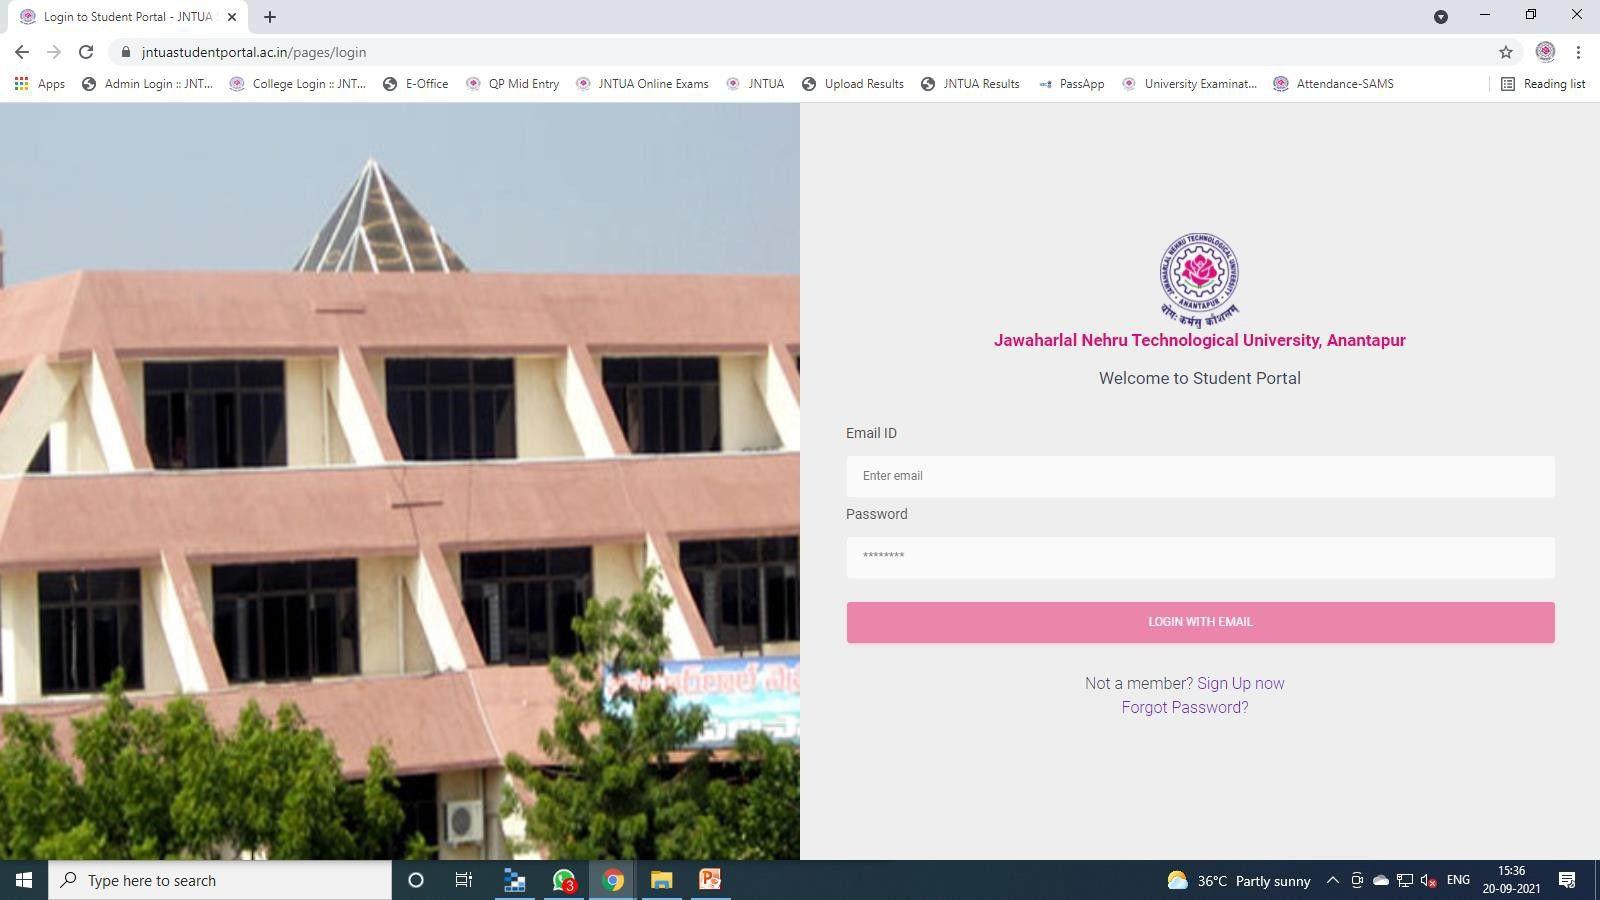 jntua-student-portal-1